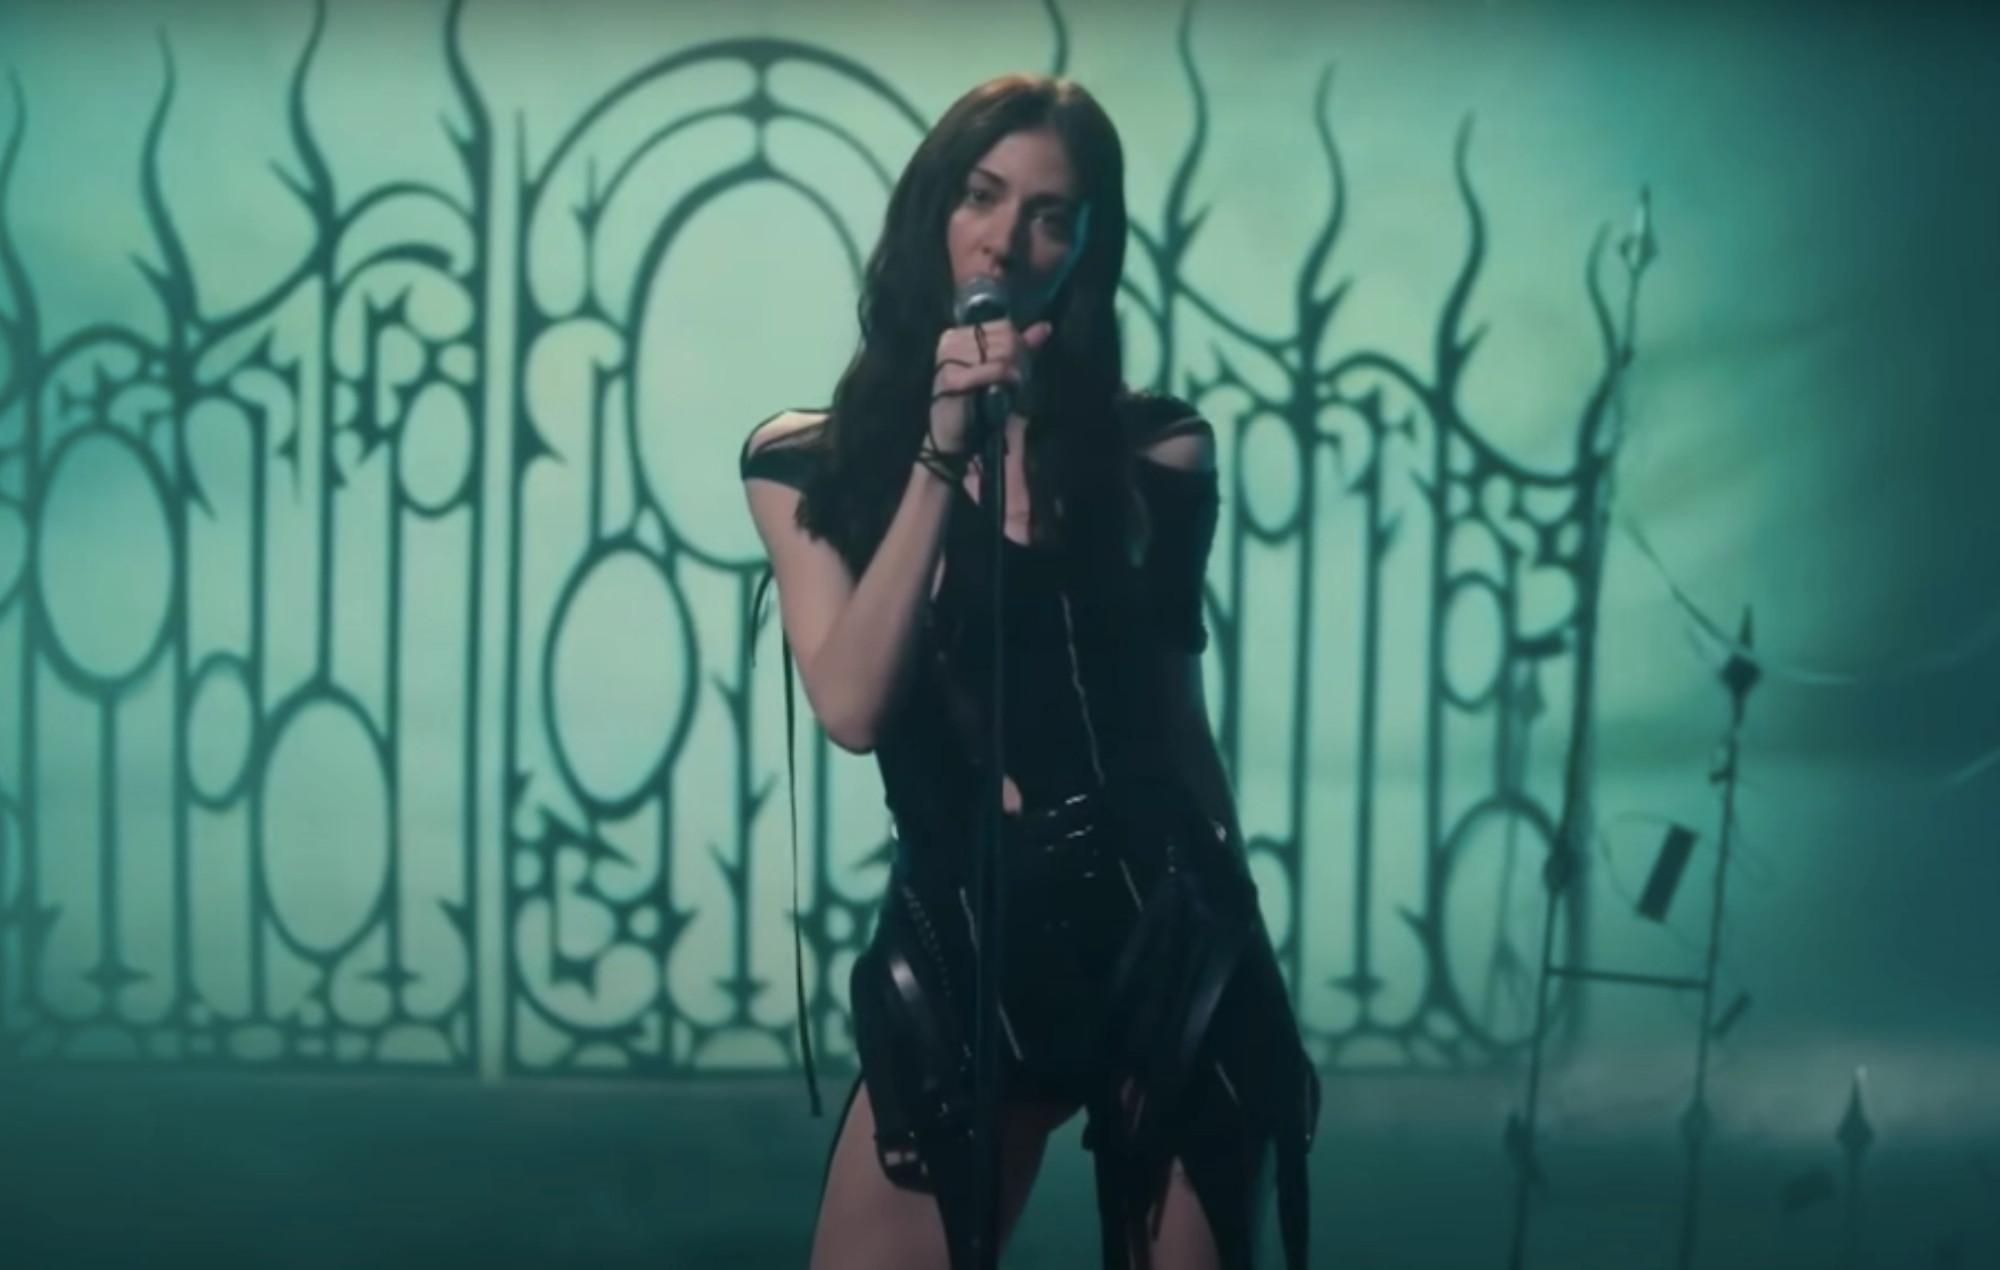 Watch Caroline Polachek perform 'Breathless' on 'The Late Late Show'